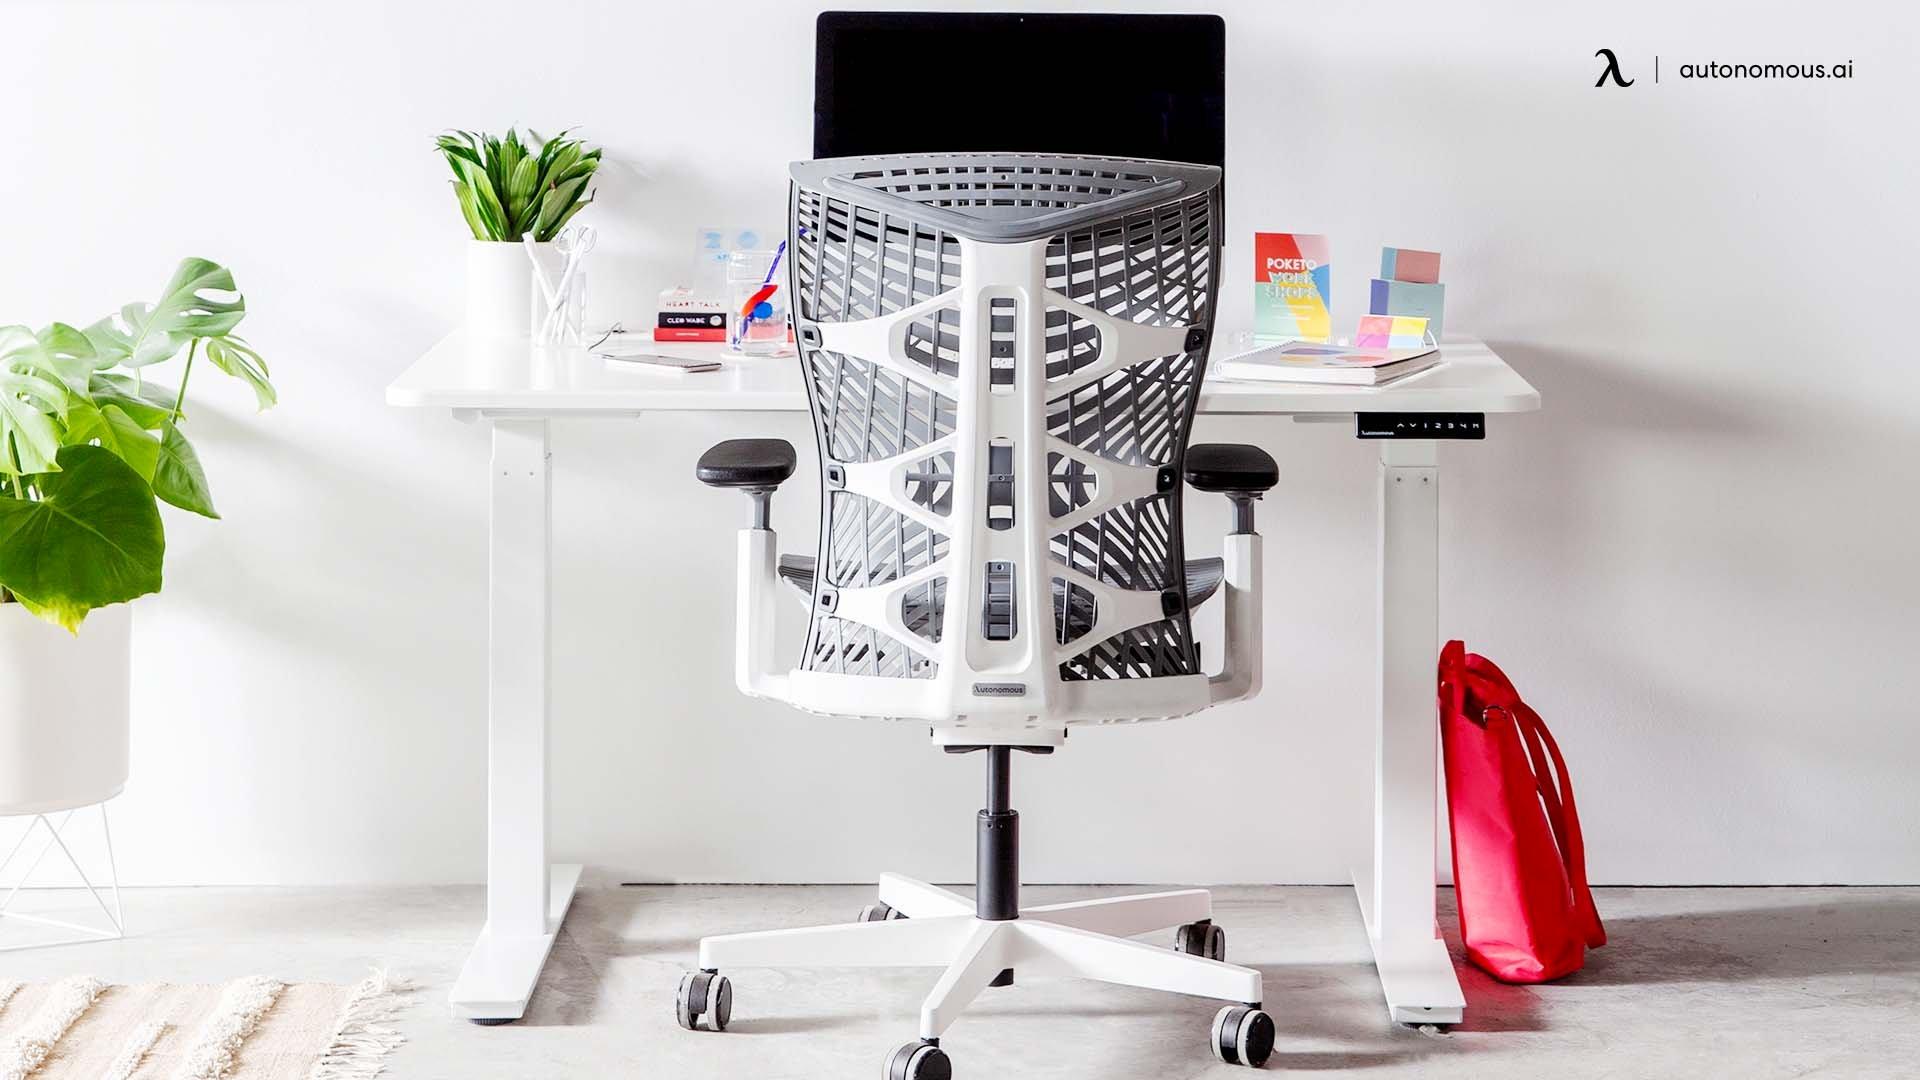 Desk - an ergonomic office furniture